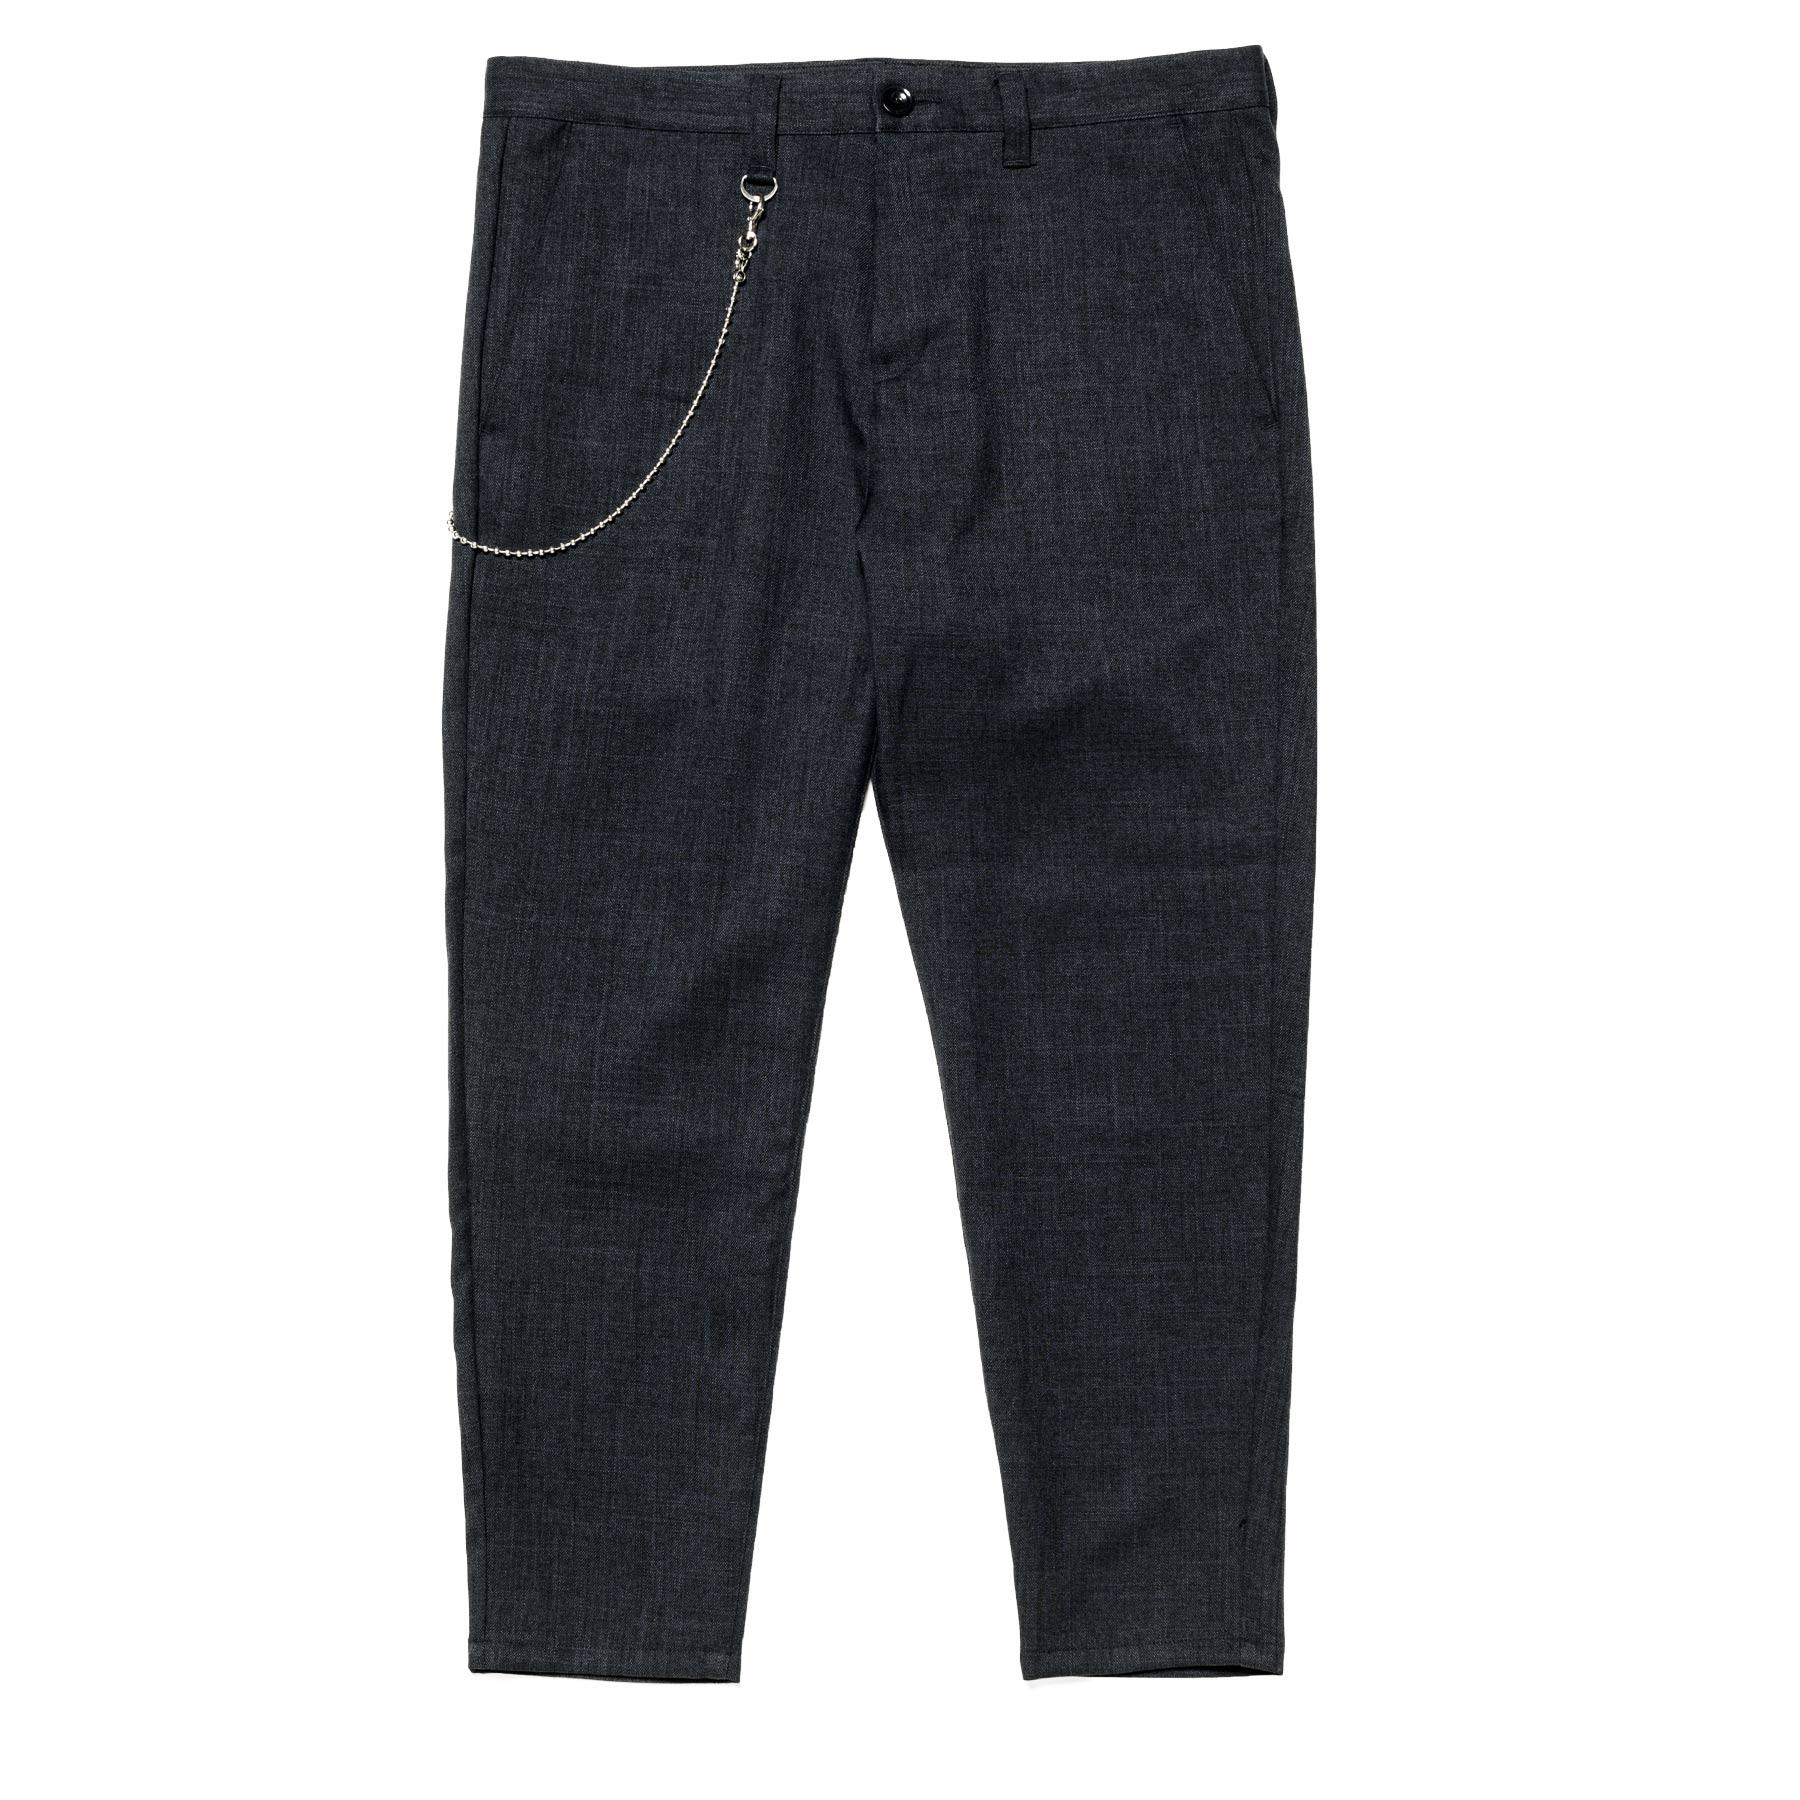 uniform experiment / CARROT FIT CROPPED PANTS -Navy